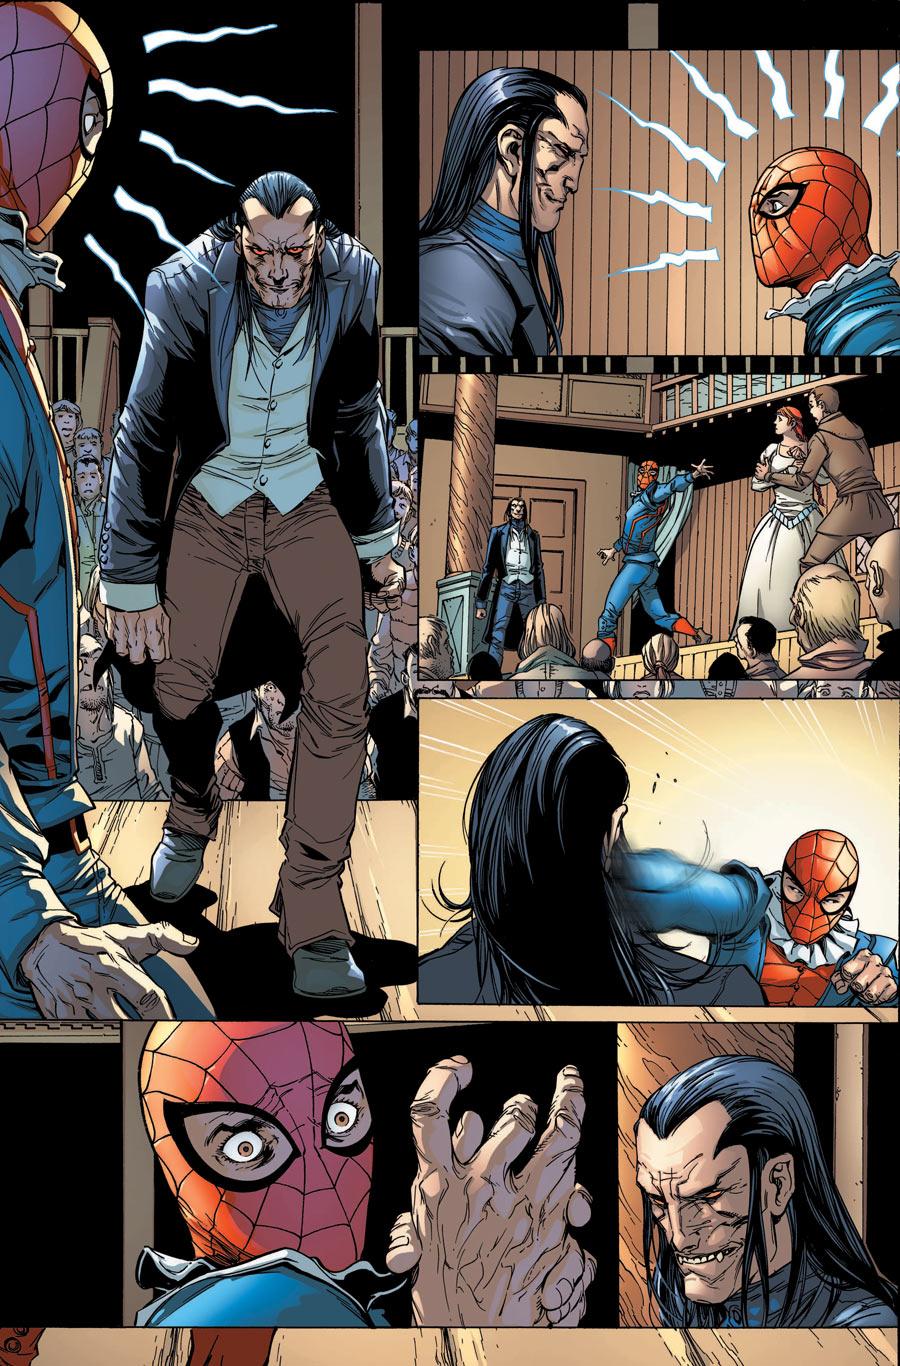 Spider-Verse-FCBD-Preview-2-64991